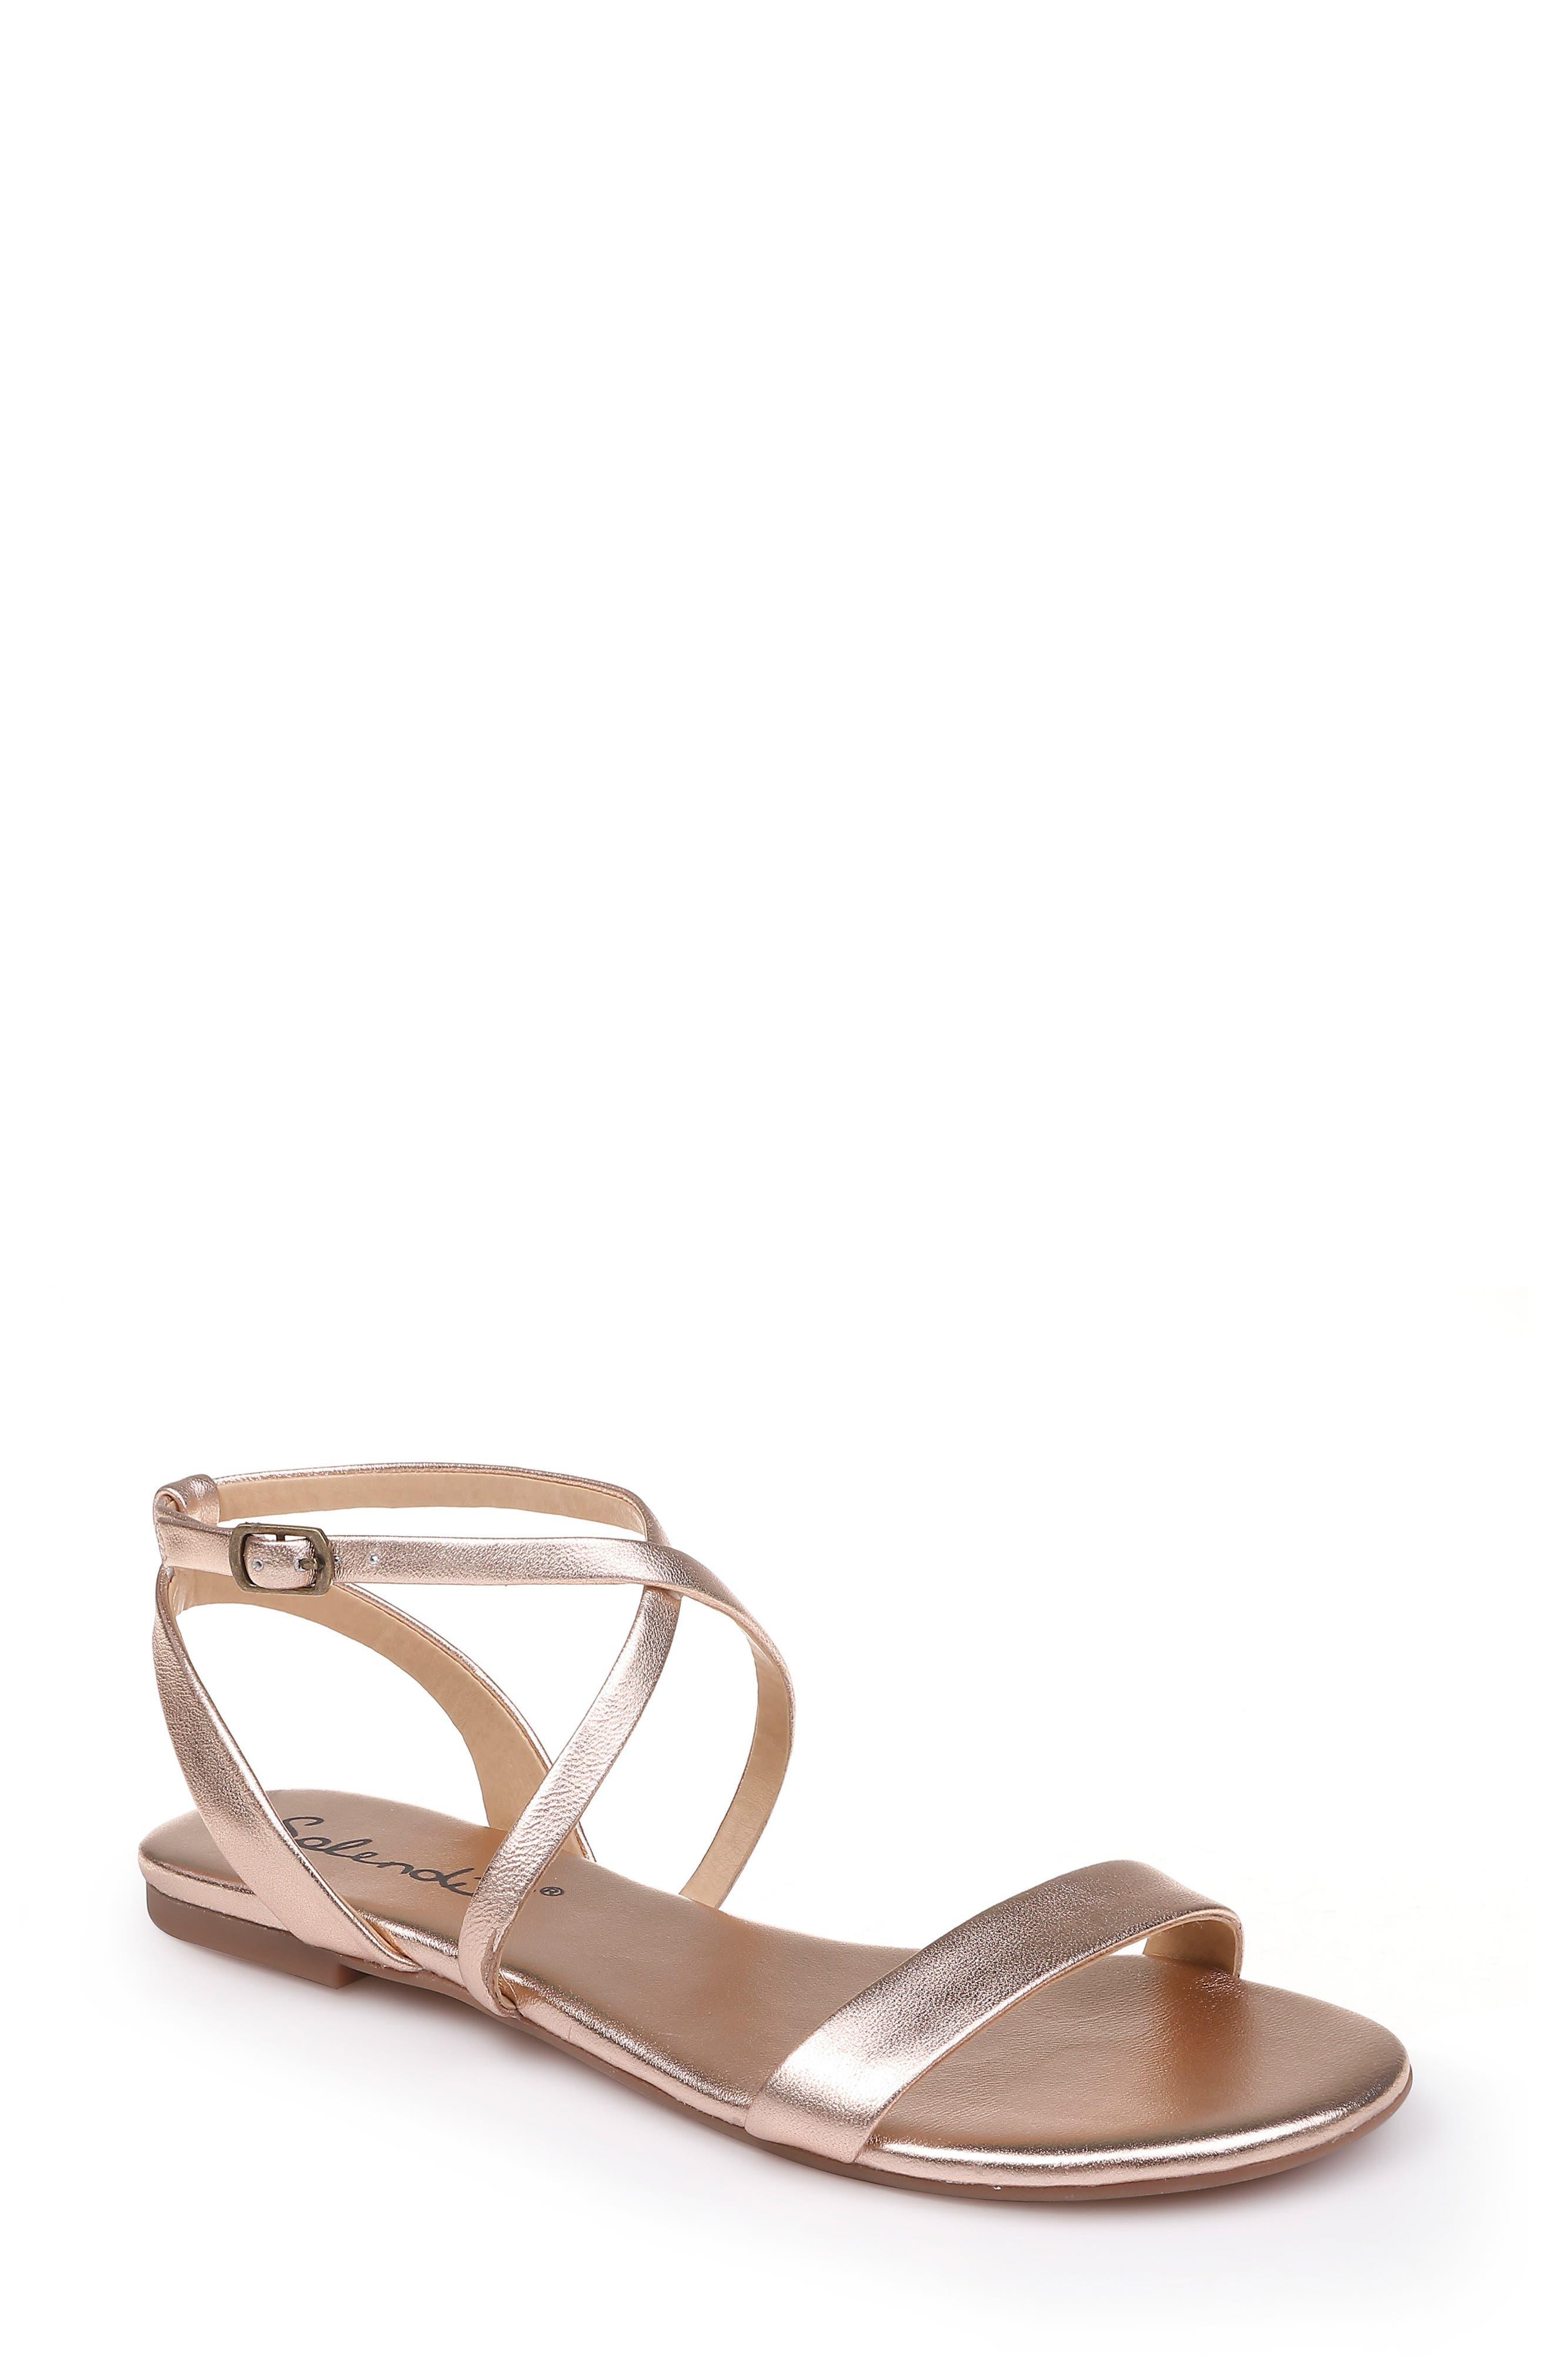 SPLENDID Susannah Strappy Sandal, Main, color, ROSE GOLD LEATHER